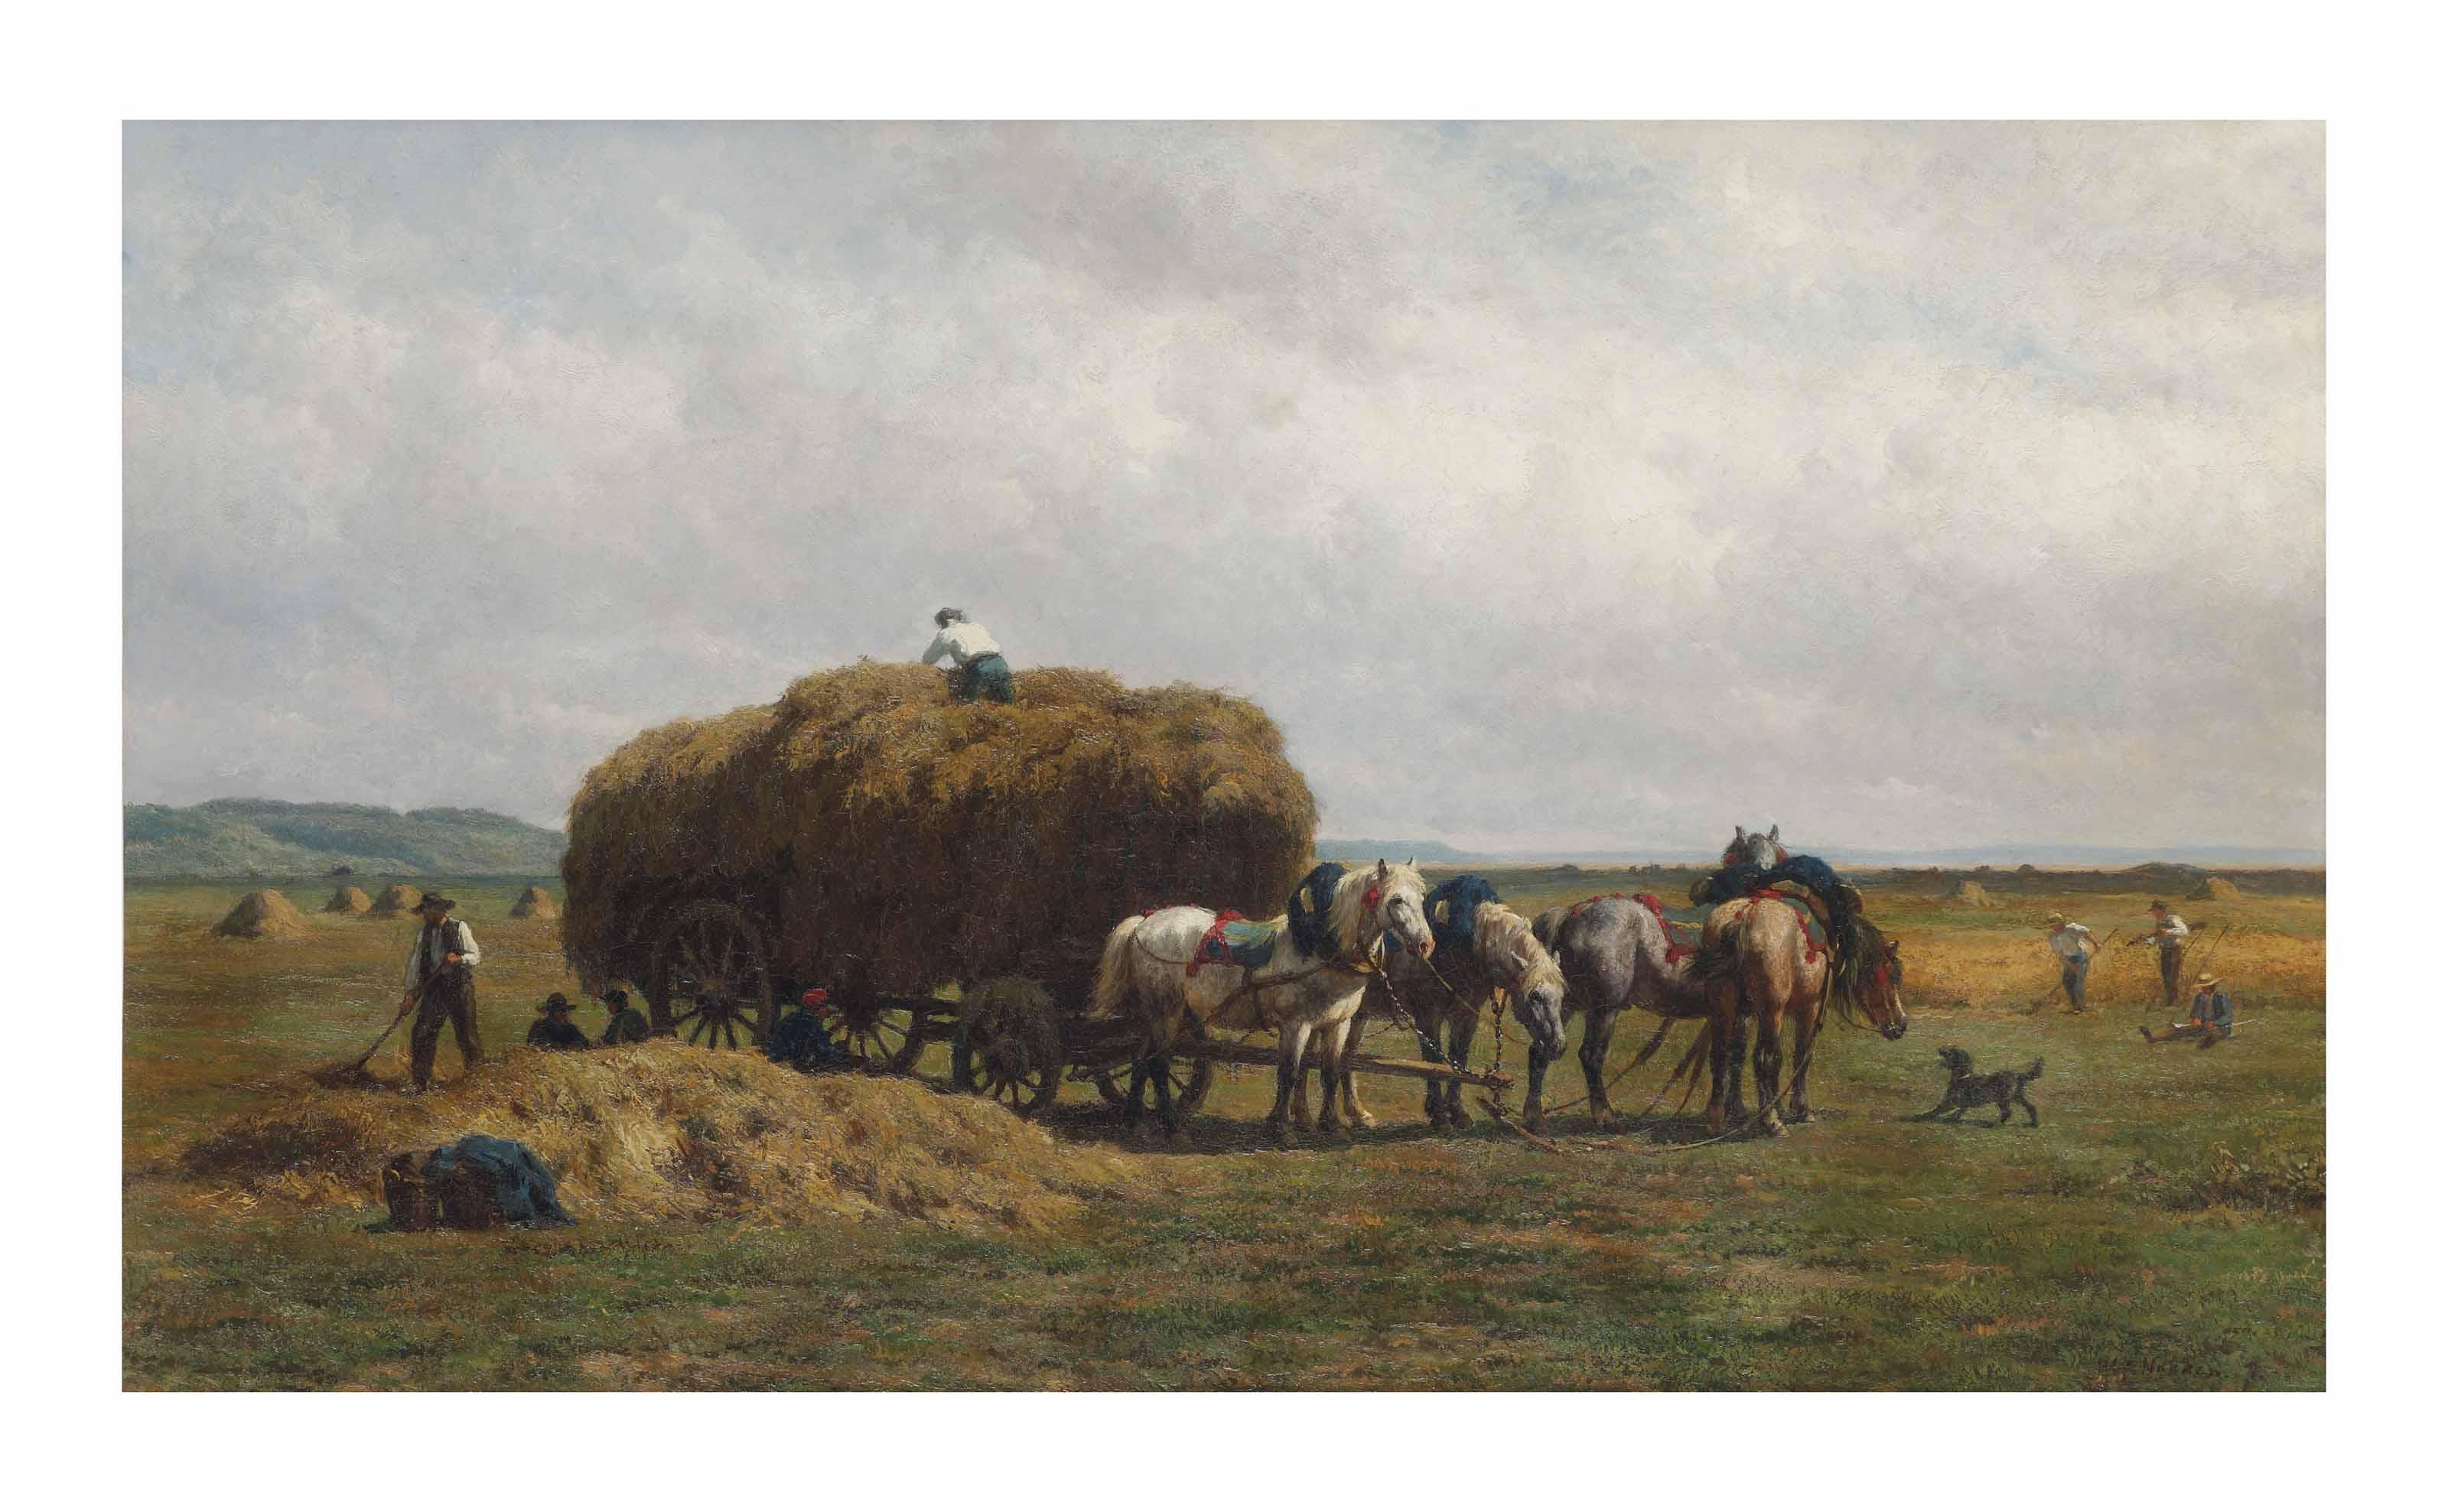 Loading the hay wagon